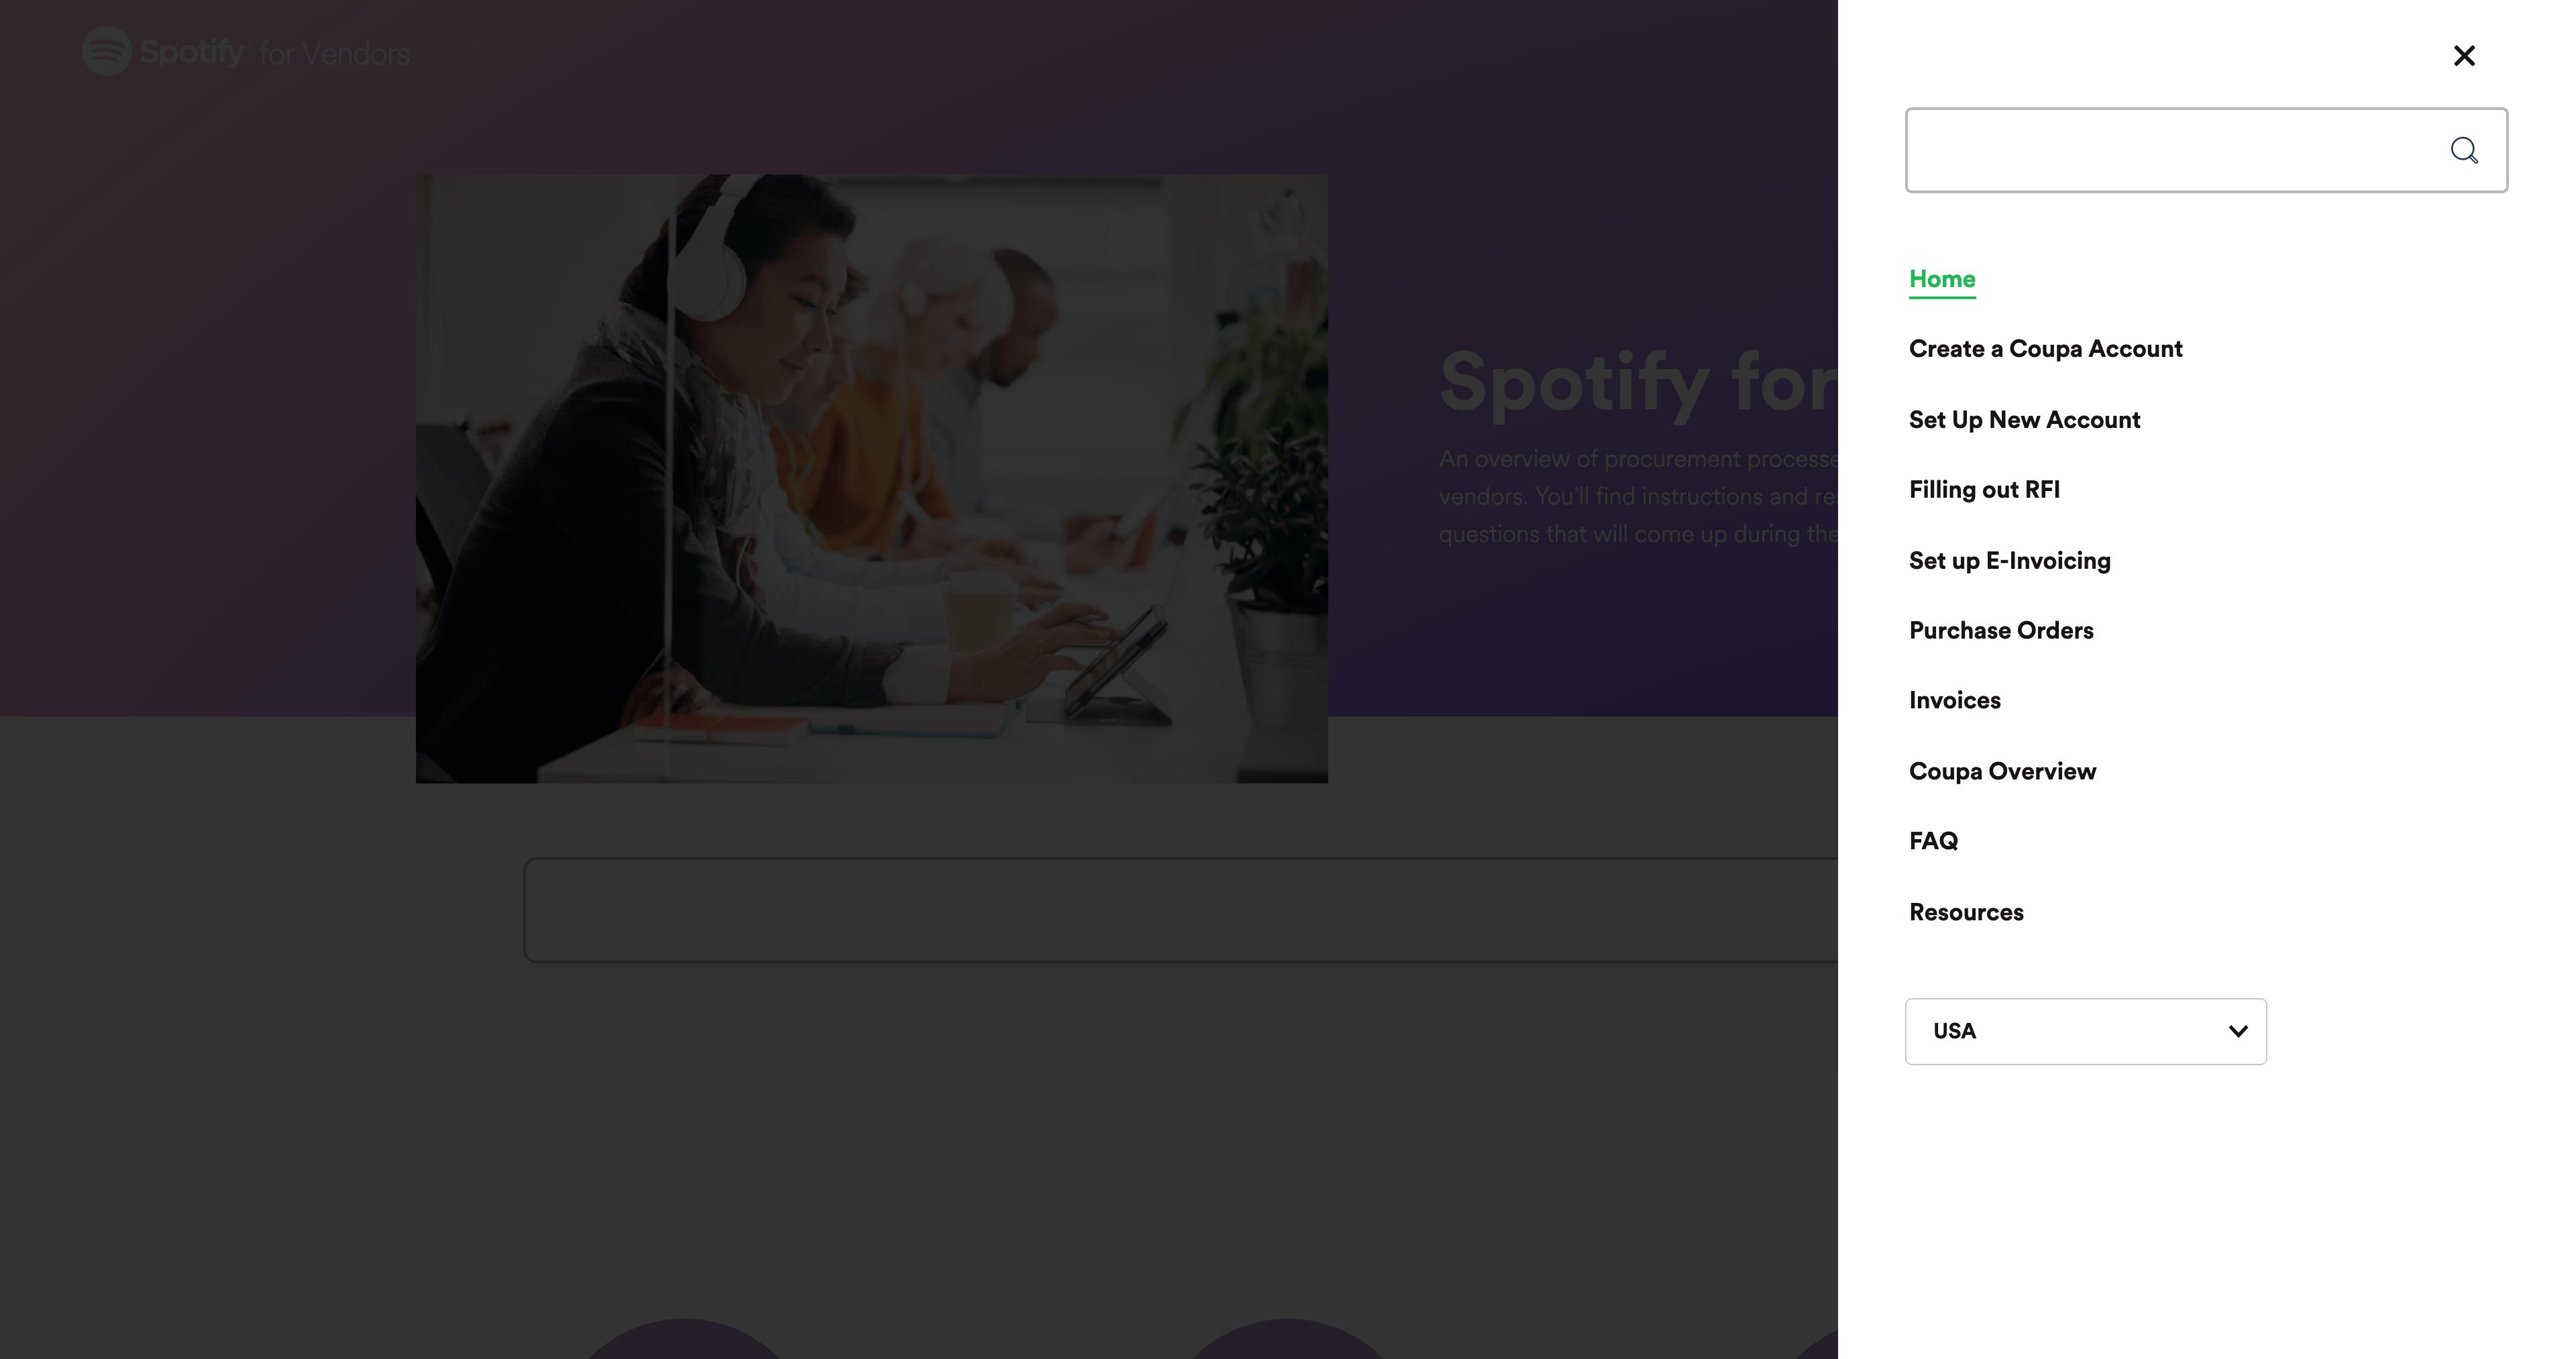 Sidebar Menu by Spotify for Vendors